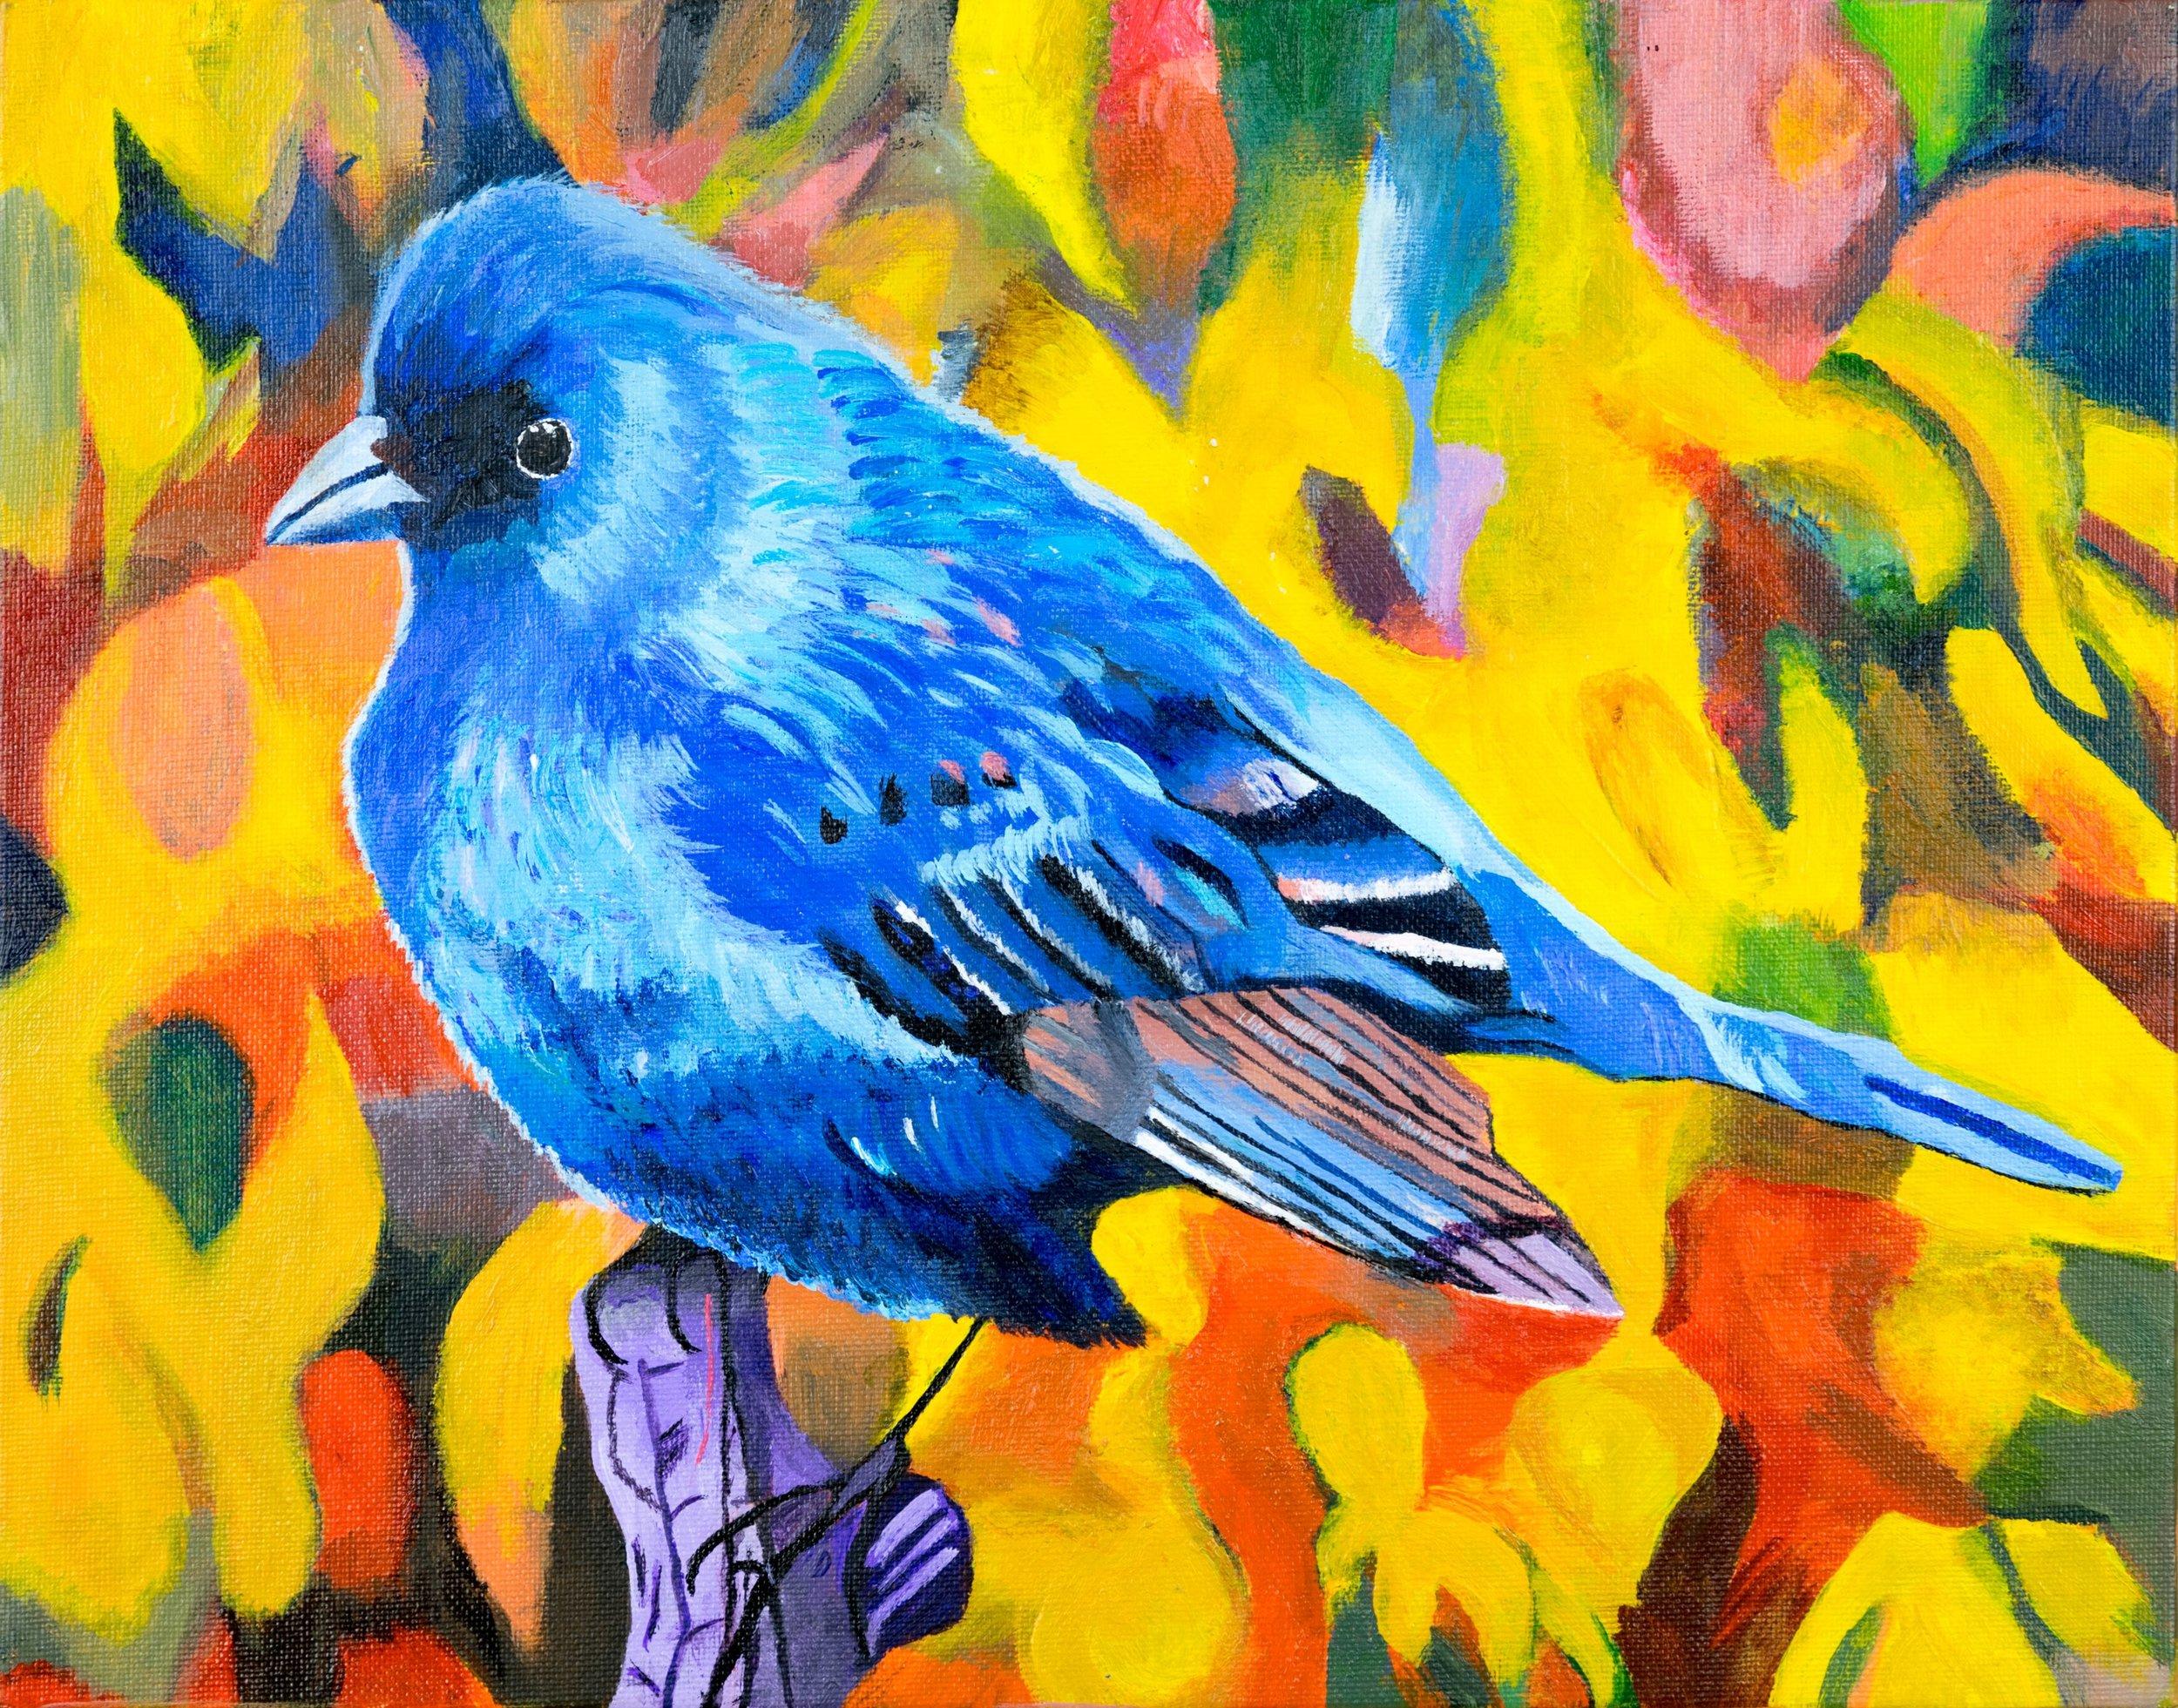 04-Kayla_Geng-Bluebird_of_Happiness.jpg